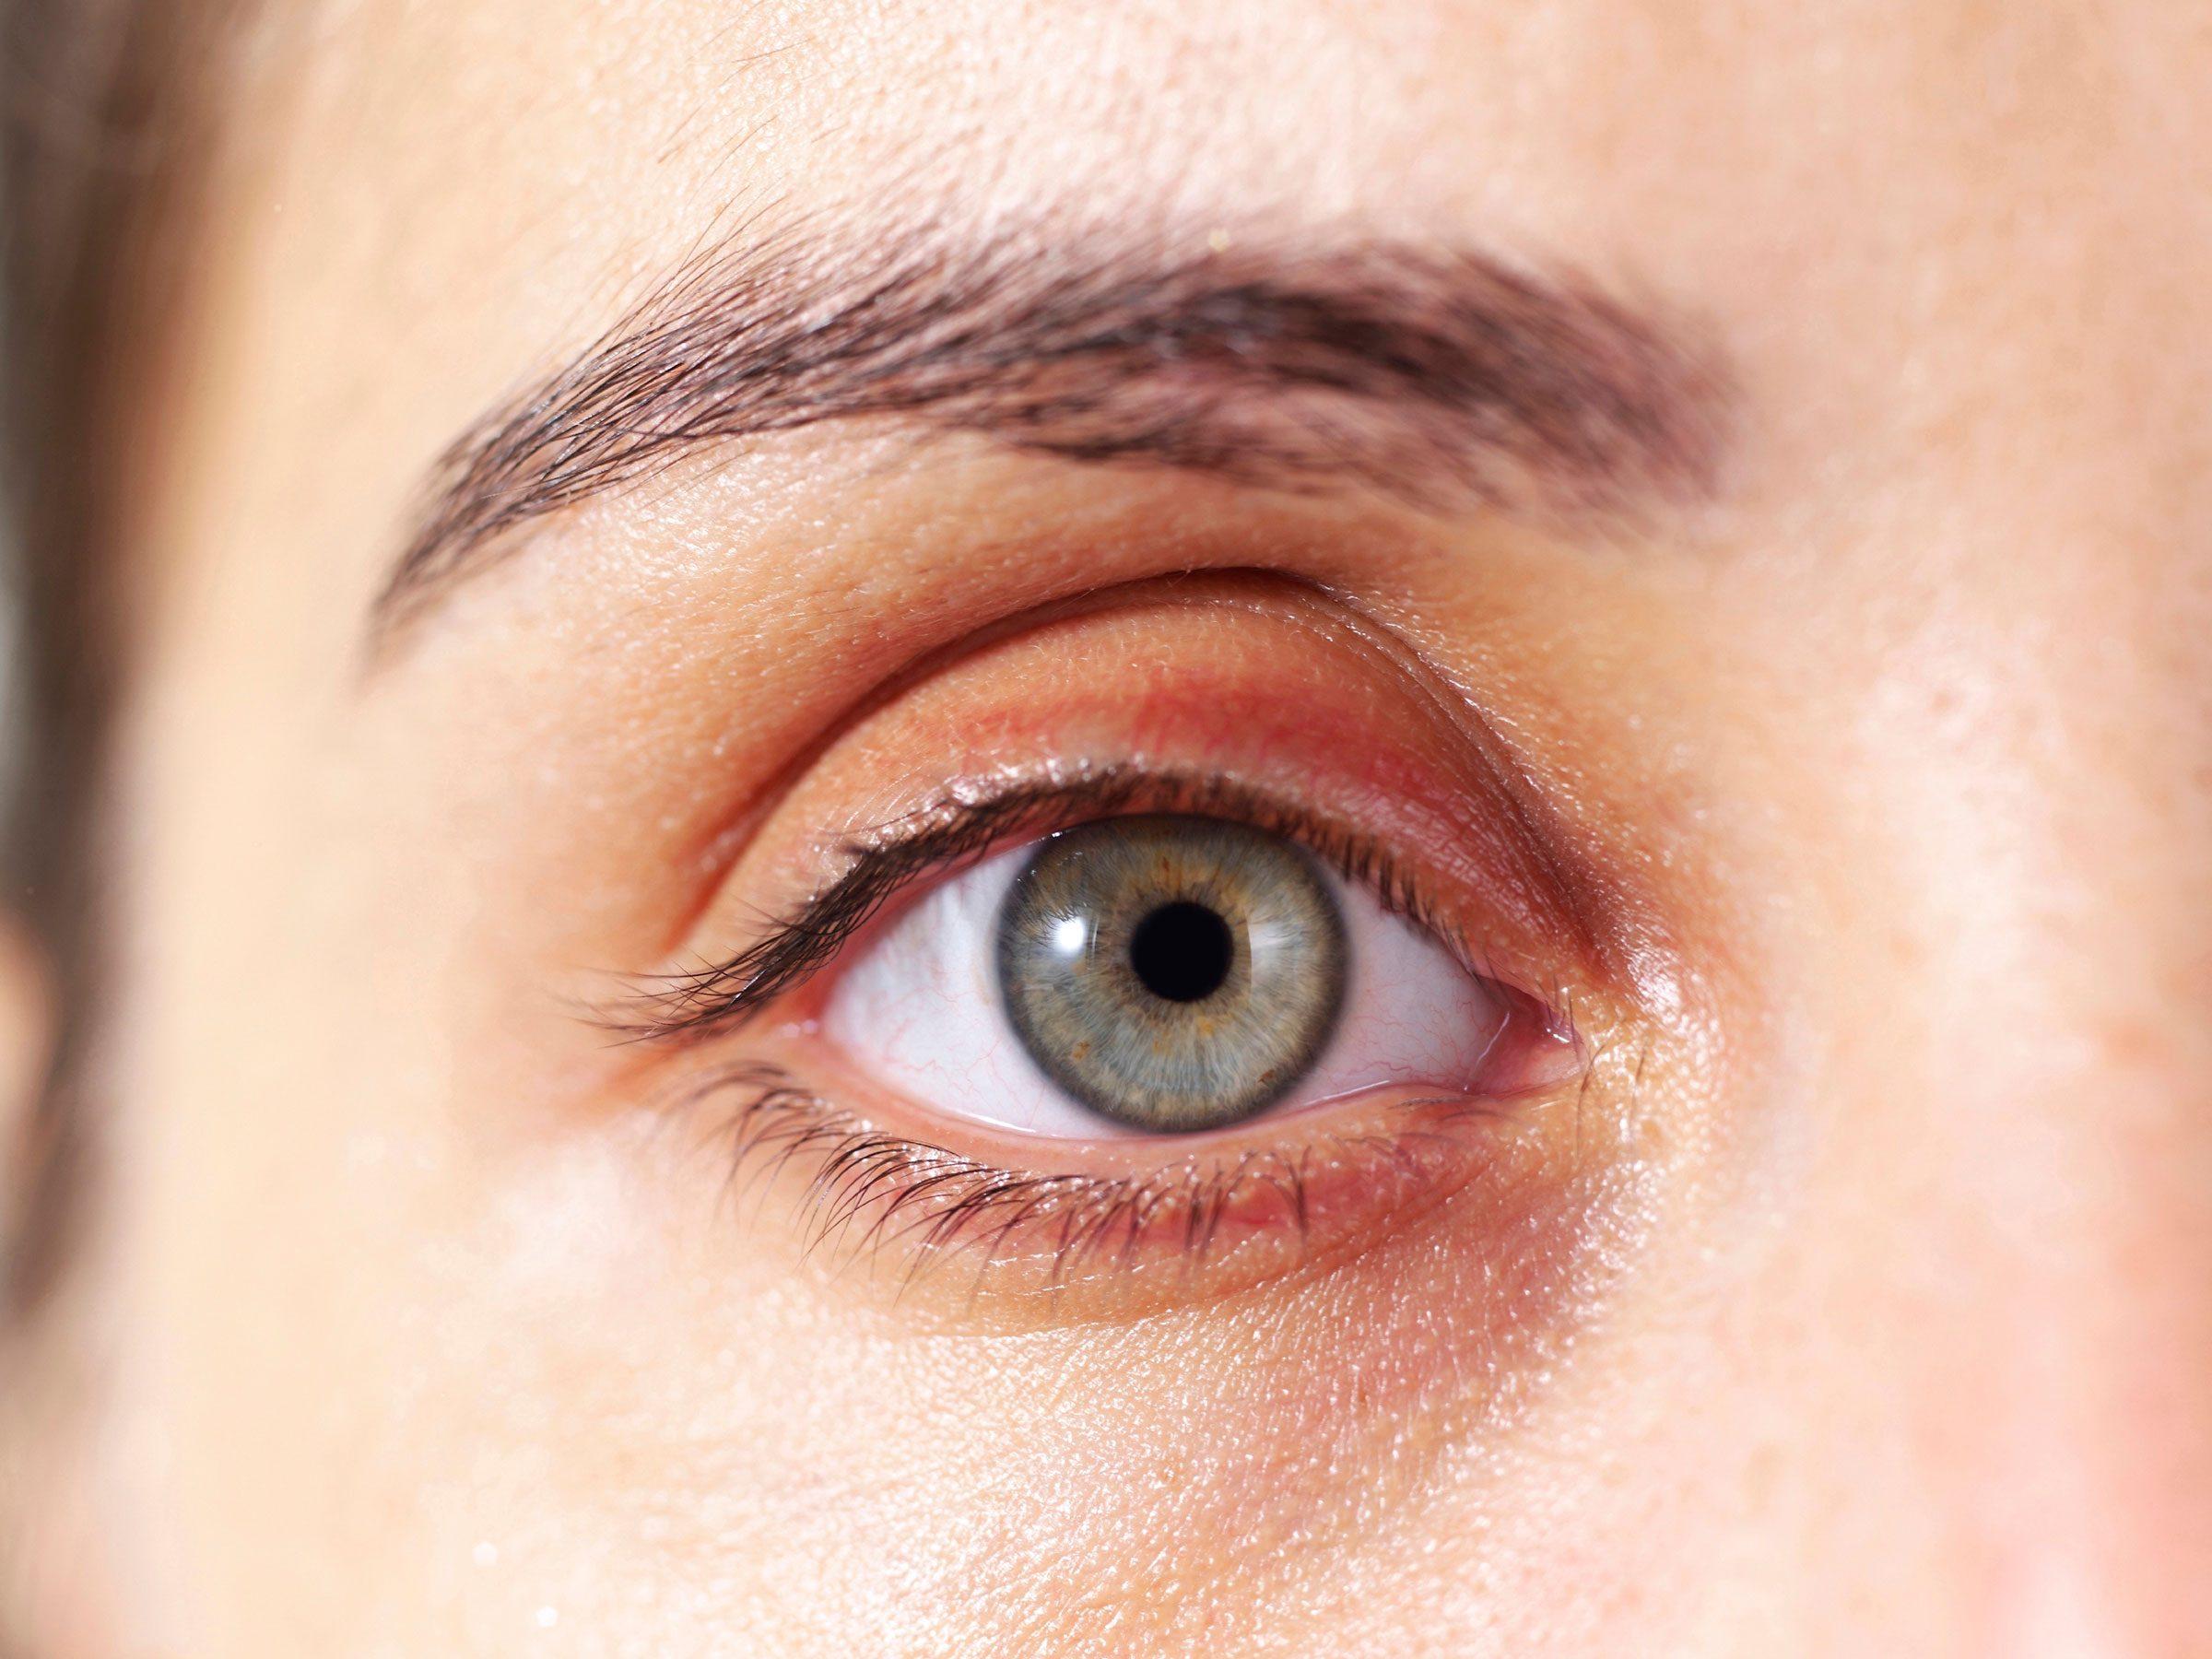 Soft, yellow spots on eyelids